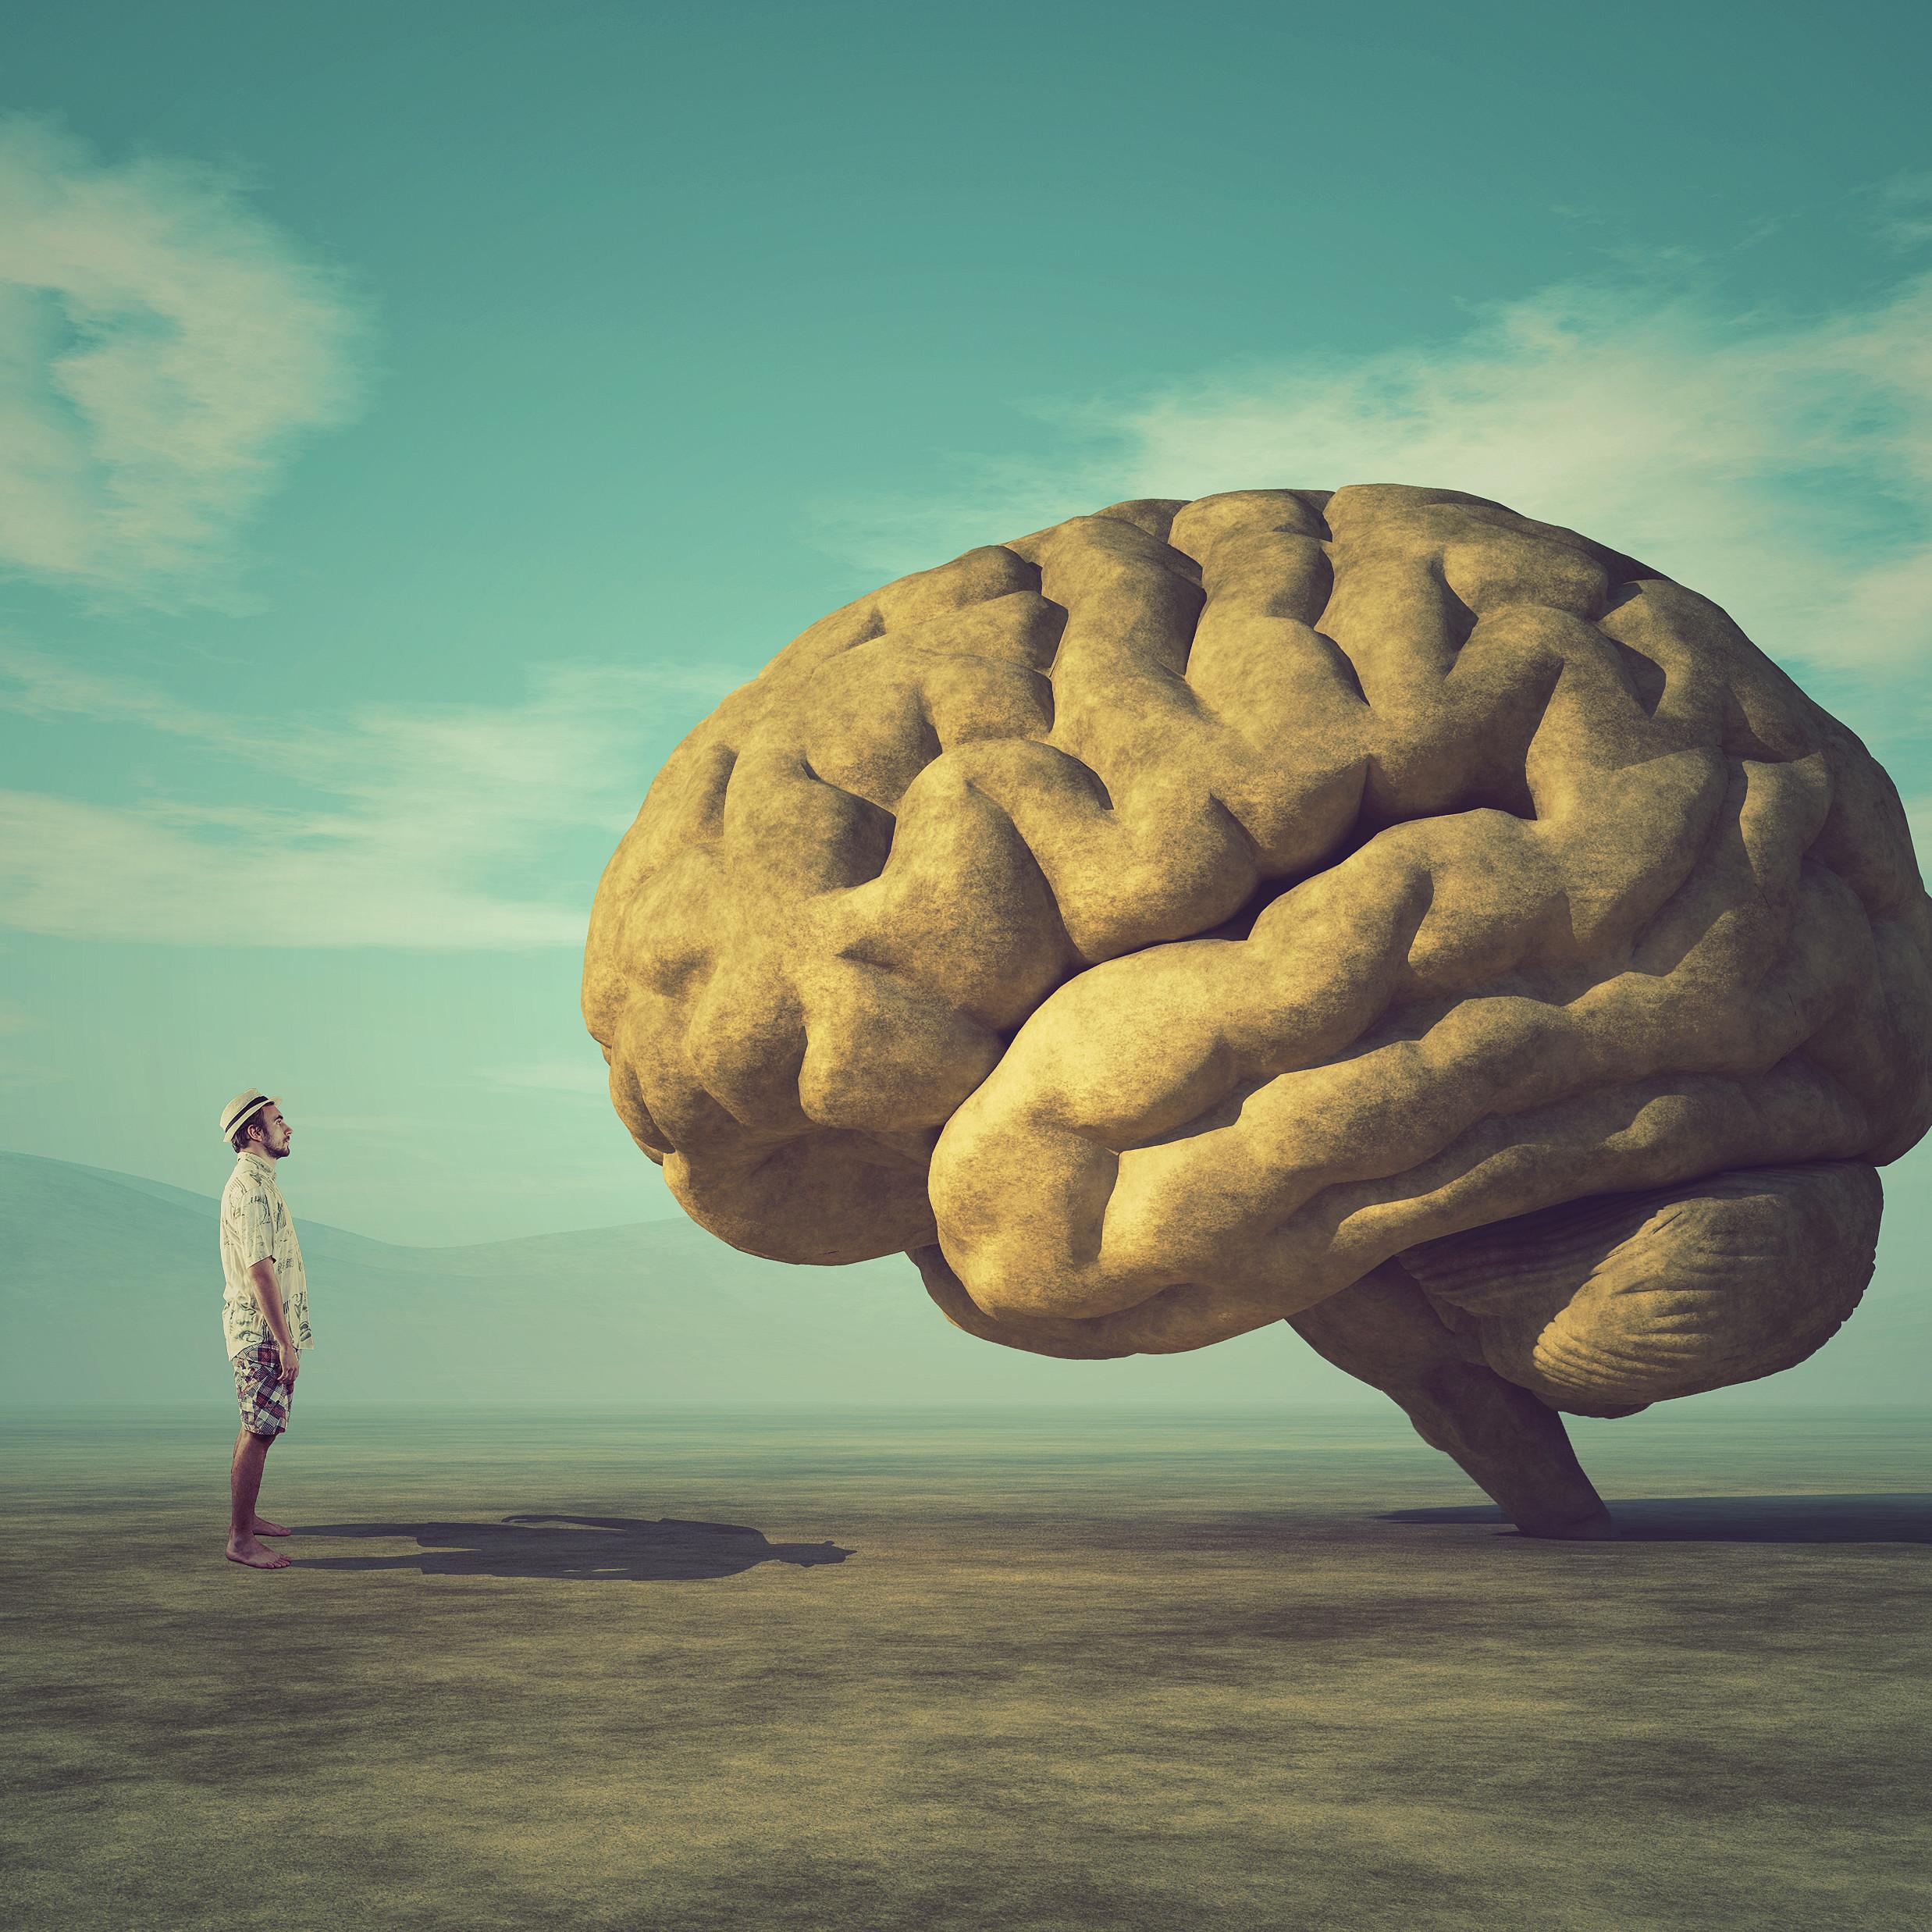 Meditation To Rewire Your Brain